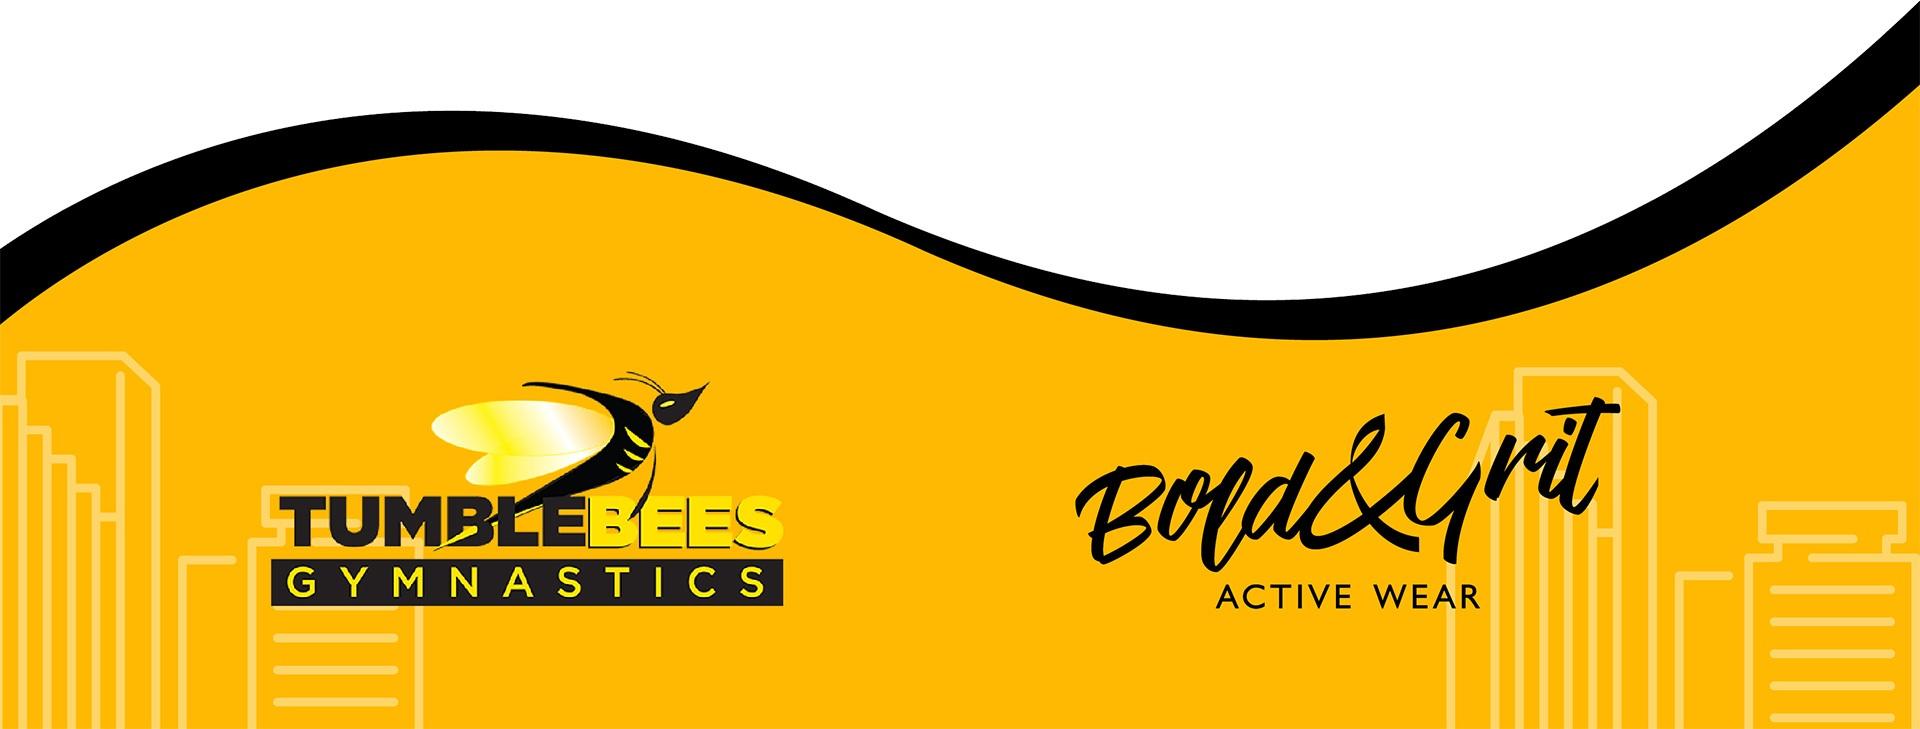 miami grit sponsor logo footer - tumblebees bold&grit